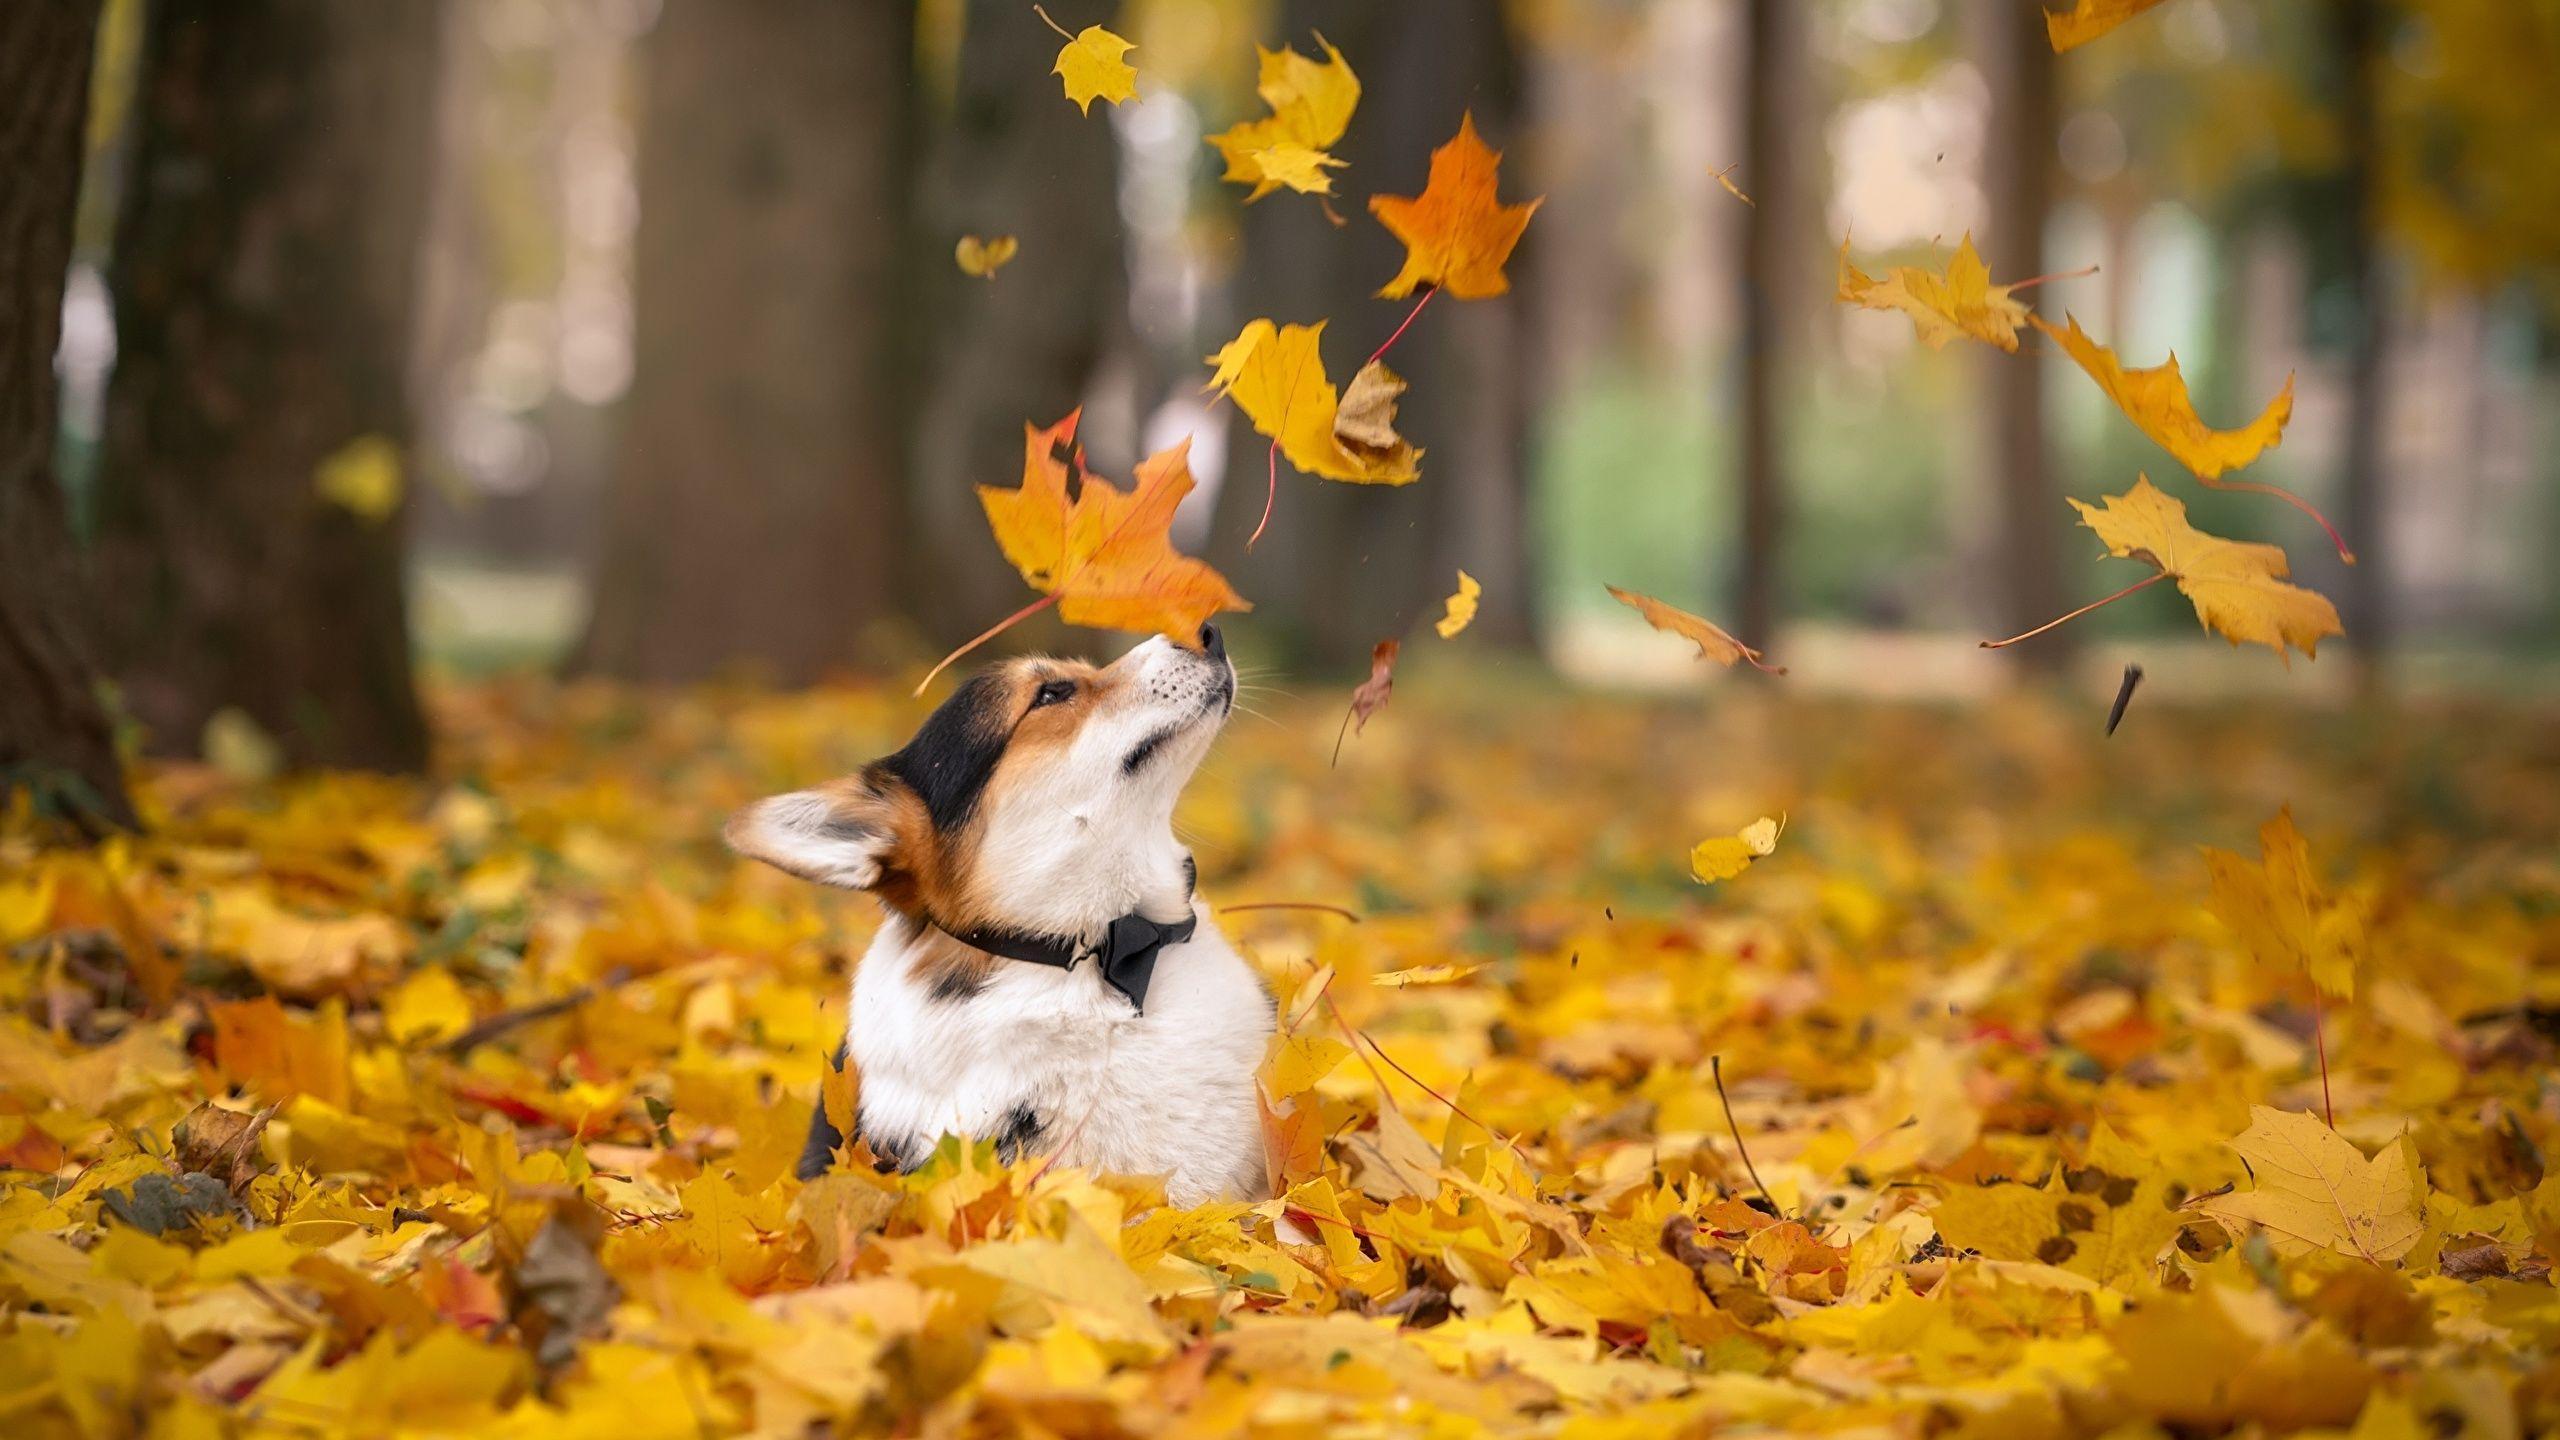 Autumn Pets Desktop Wallpapers Top Free Autumn Pets Desktop Backgrounds Wallpaperaccess